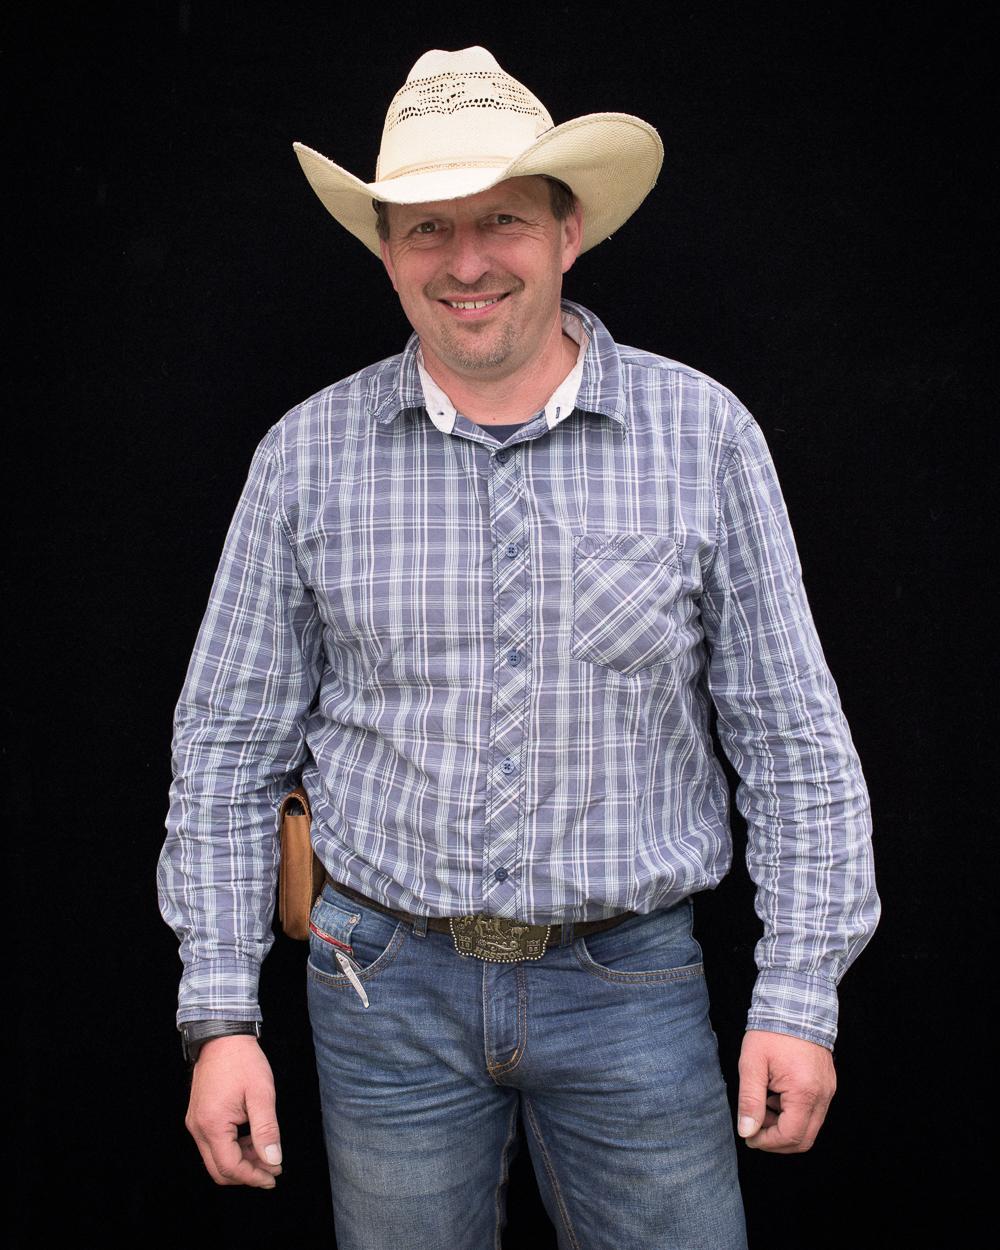 cowboys-9225-Edit.jpg